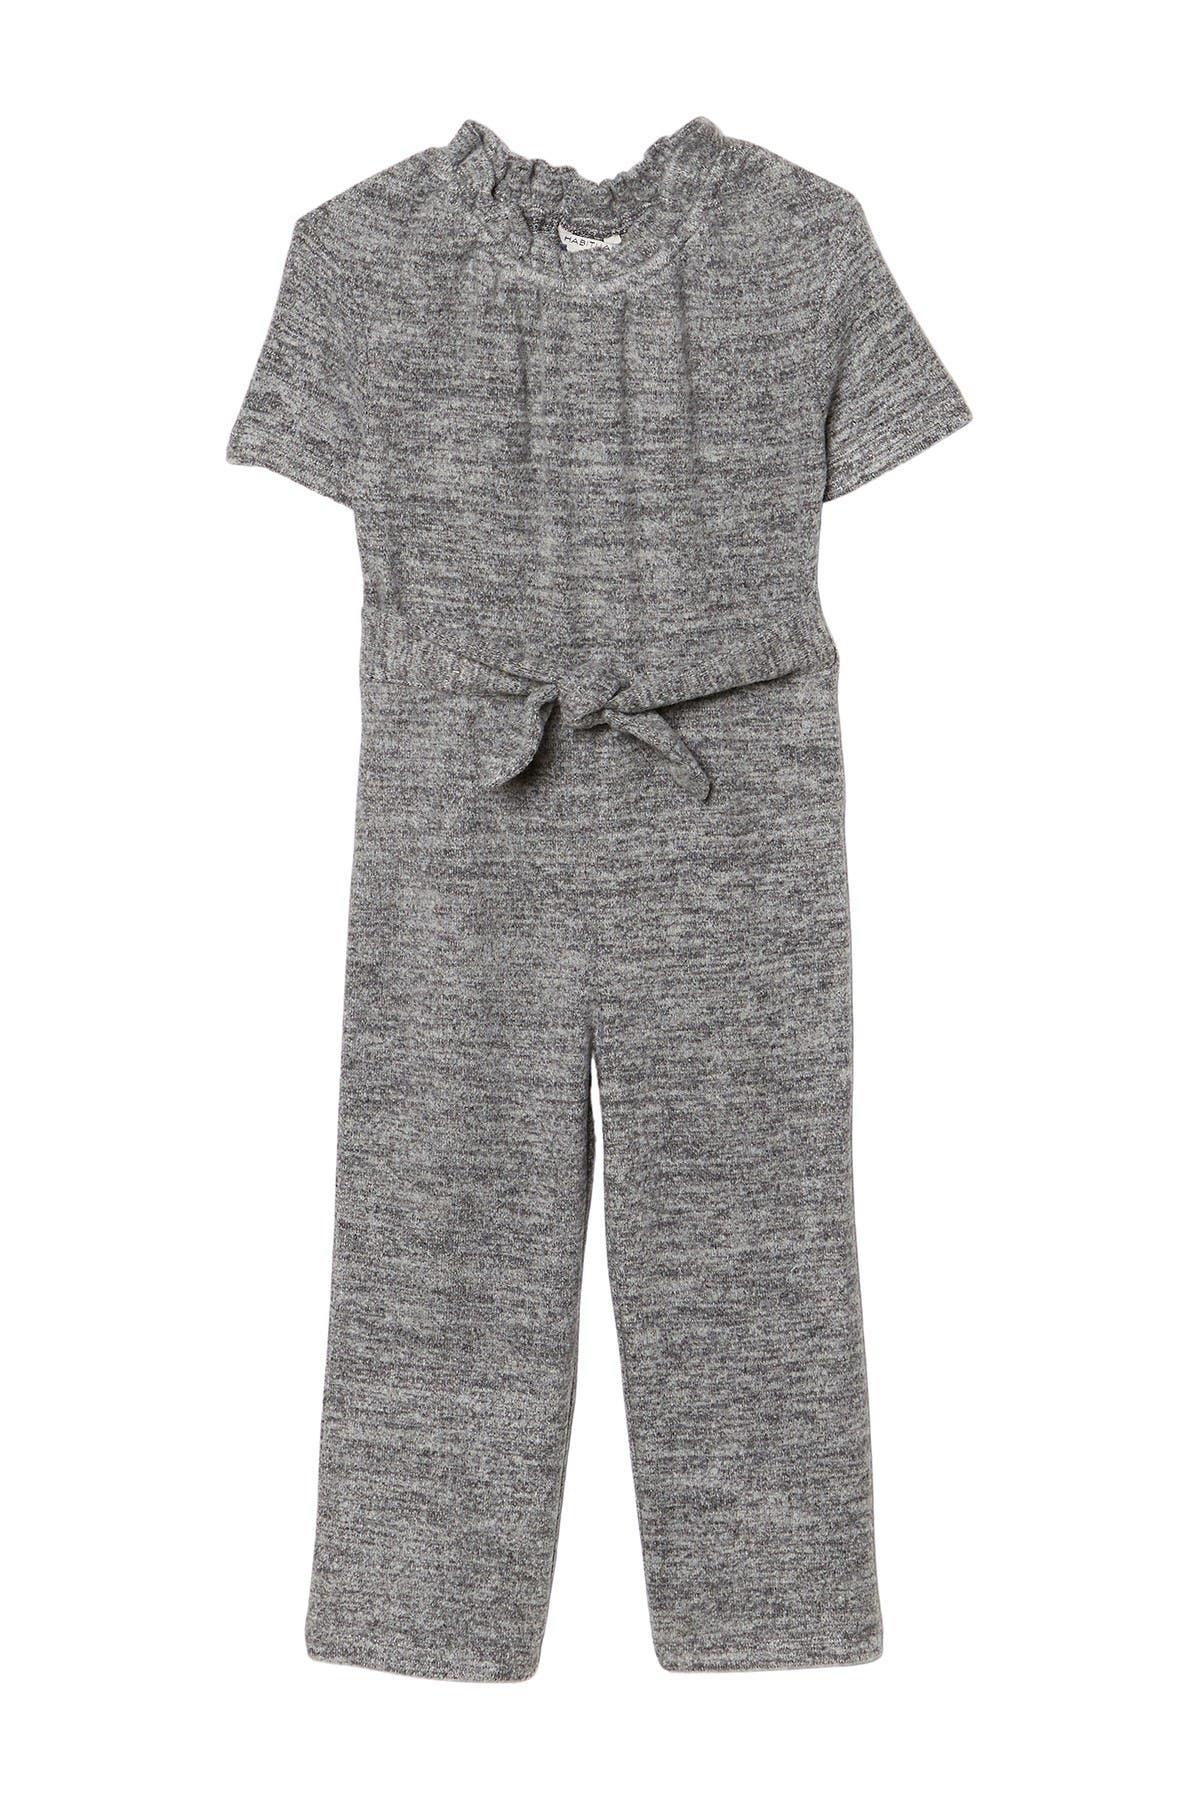 Image of Habitual Emelia Hatchi Knit Jumpsuit